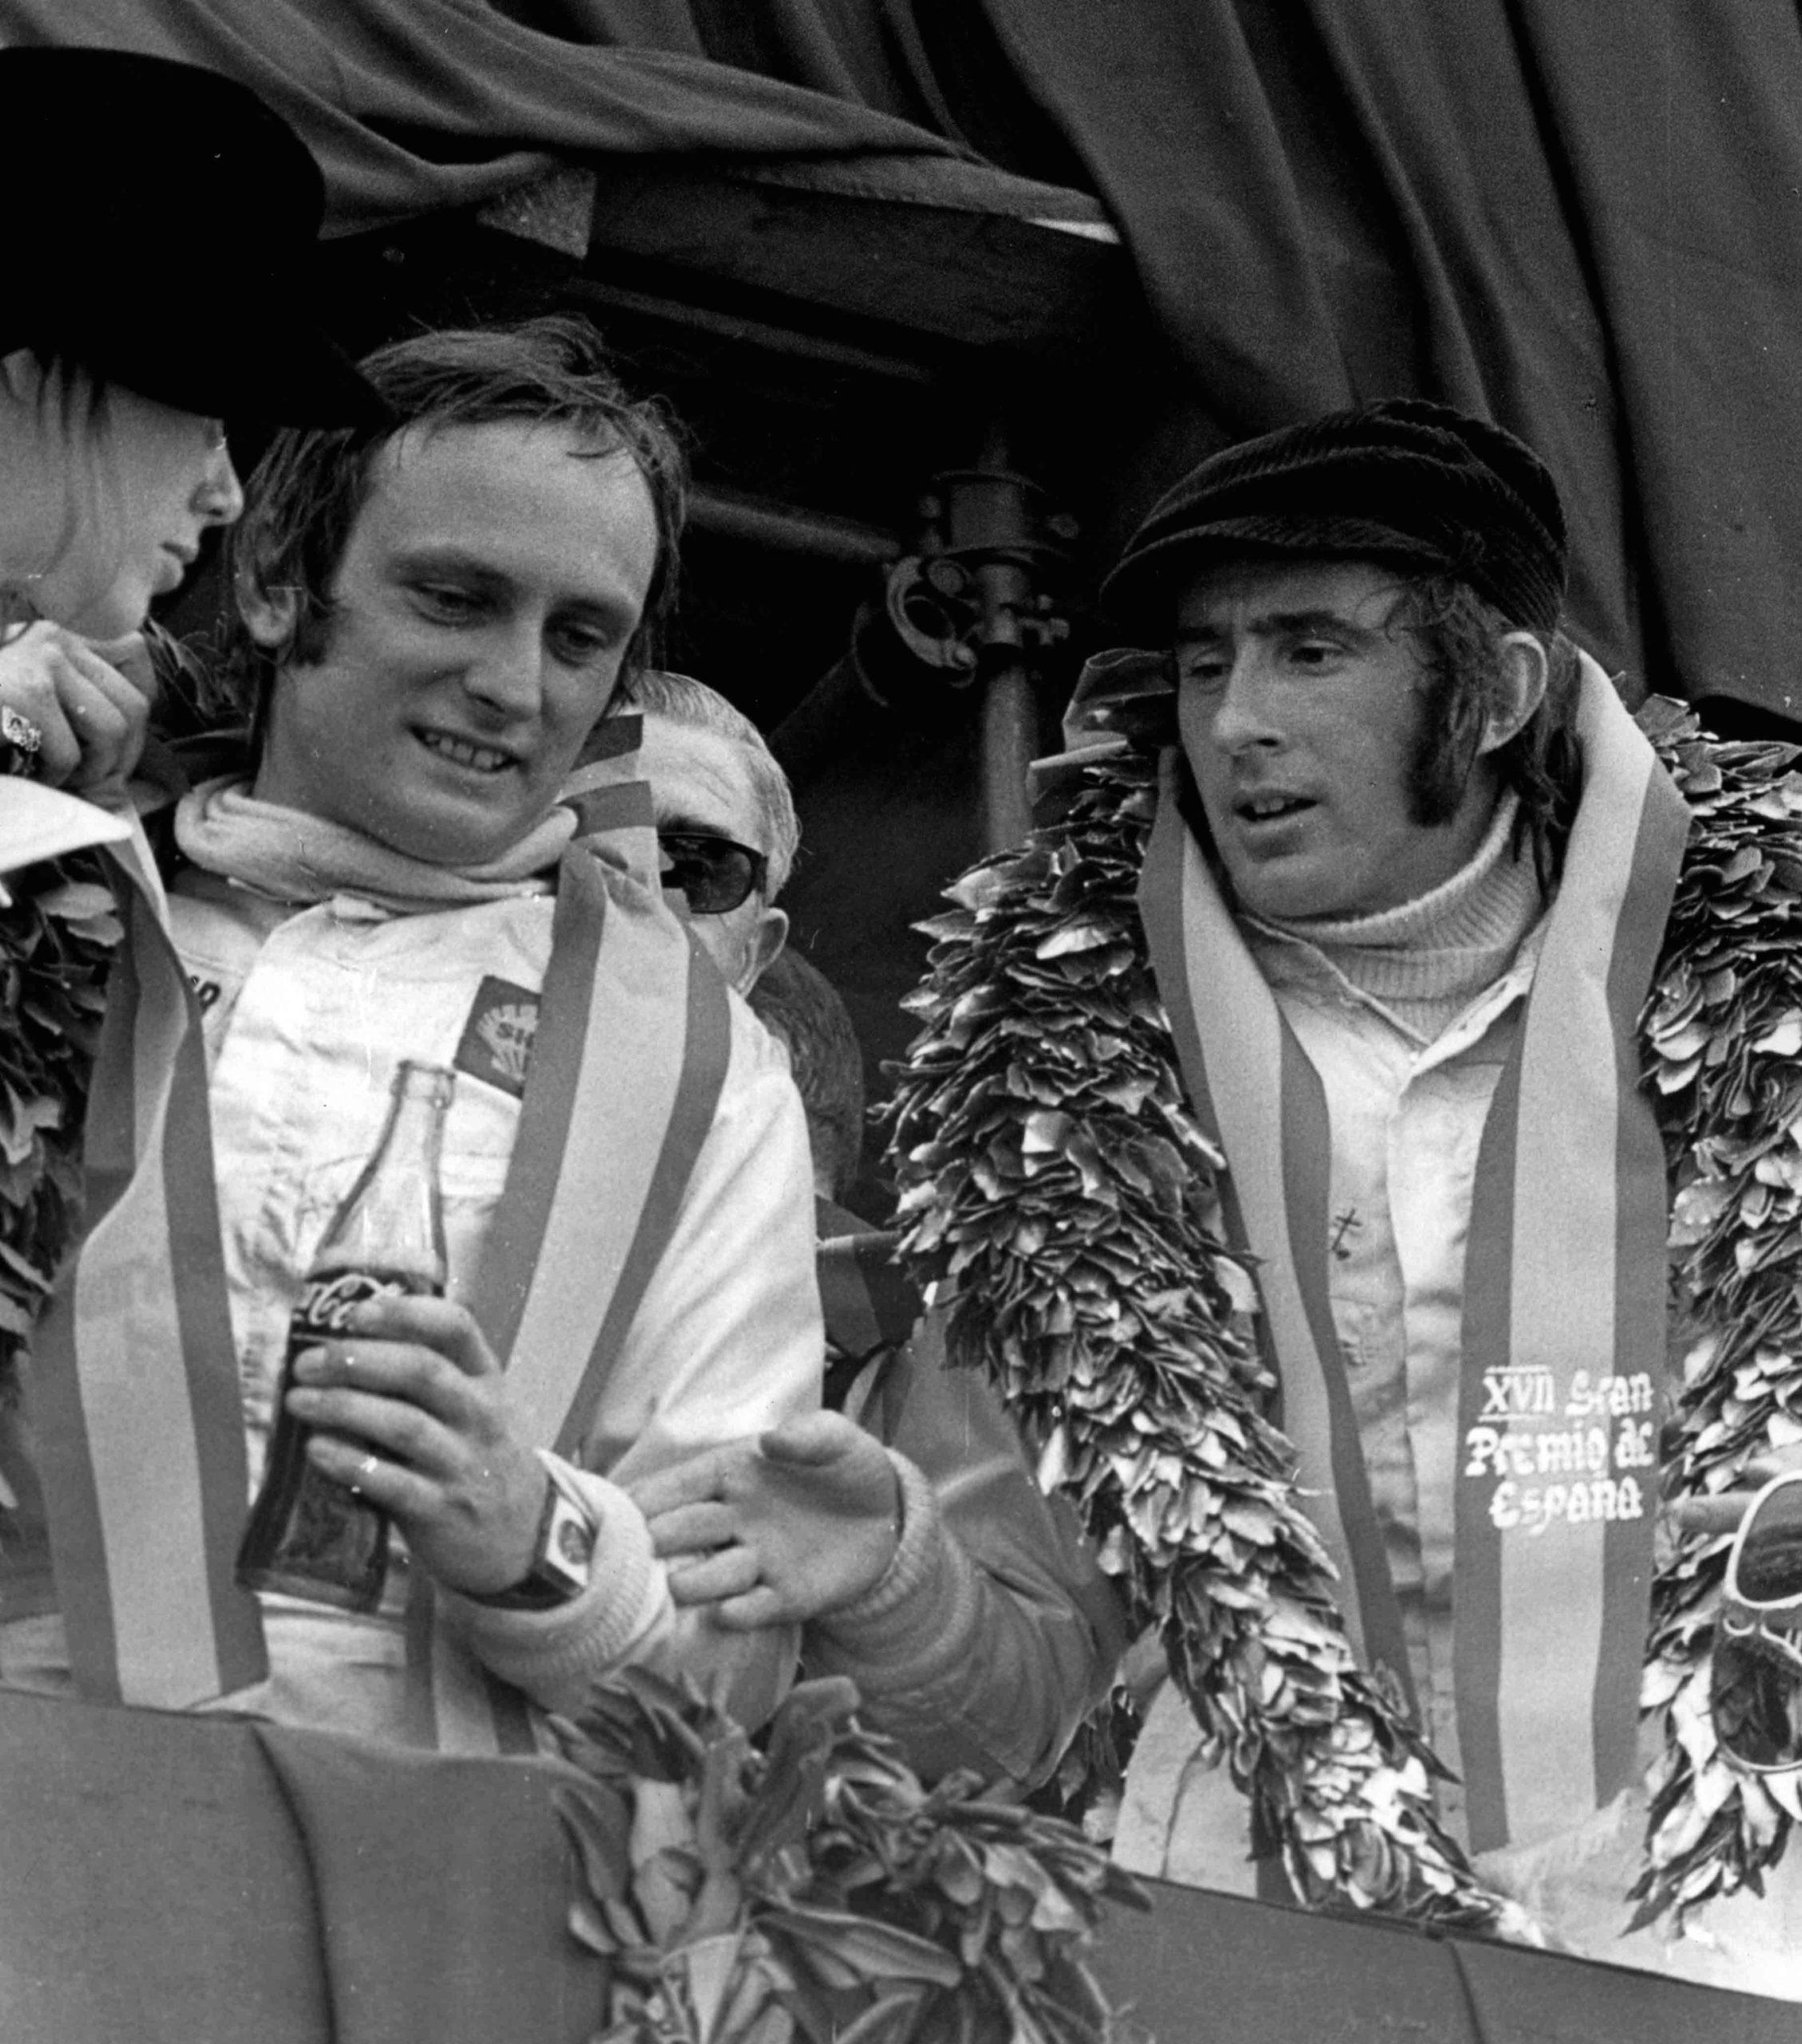 Jackie-Stewart-on-the-podium-at-the-1971-Spanish-Grand-prix